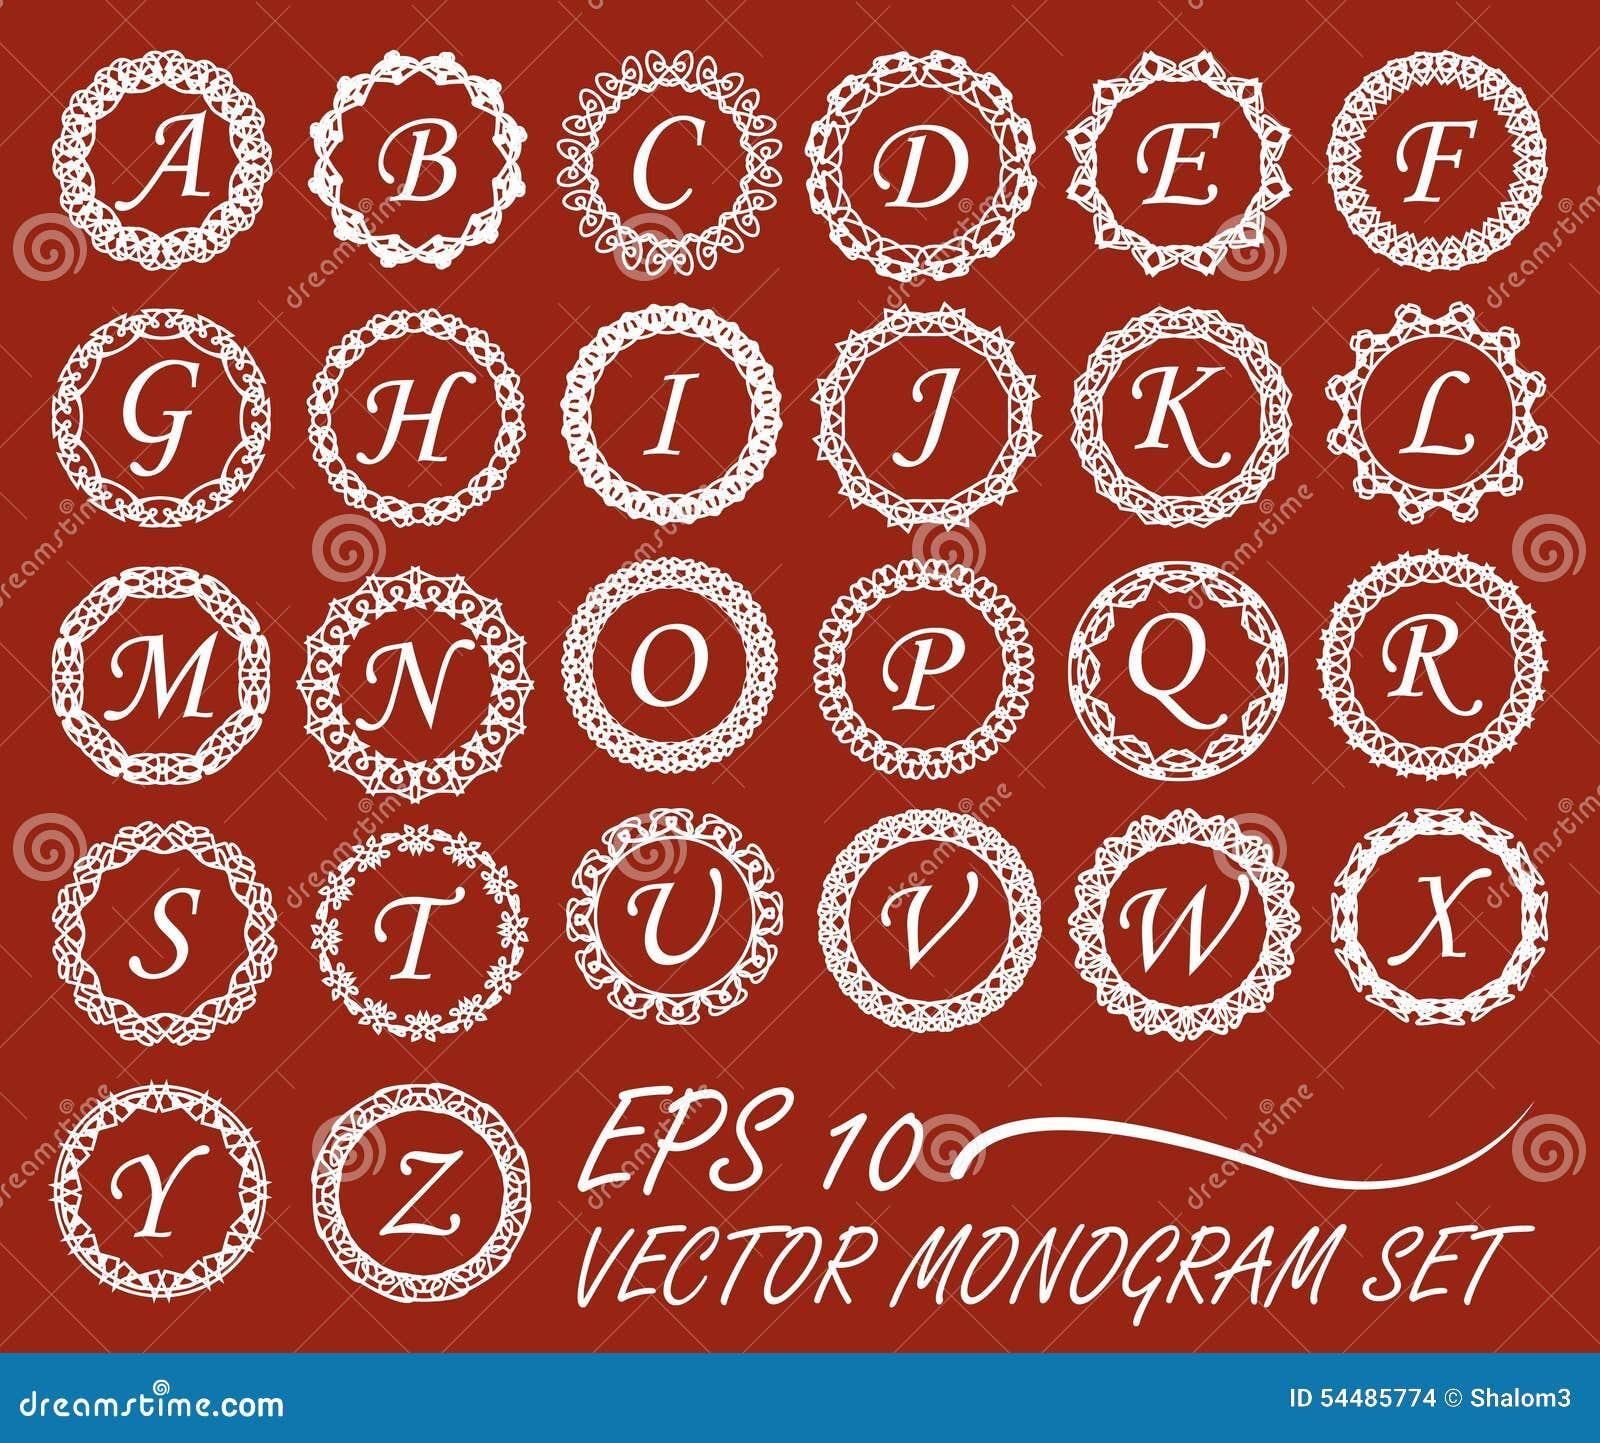 Free Letter Monogram Template on monogram letters clip art, monogram initials clip art free, monogram embroidery letters free, easy embroidery templates free, monogram shapes, monogram styles initials, monogram templates for word, monogram outline free, monogram on a pillow cover diy, hand stitched embroidery designs free, letter d clipart free, monogram logos free printables, monogram initials templates, monogram styles clip art free, lilly pulitzer monogram binder covers free, monogram svg bunny ears, monogram patterns, monogram online free, monogram samples, monogram wedding cake templates,